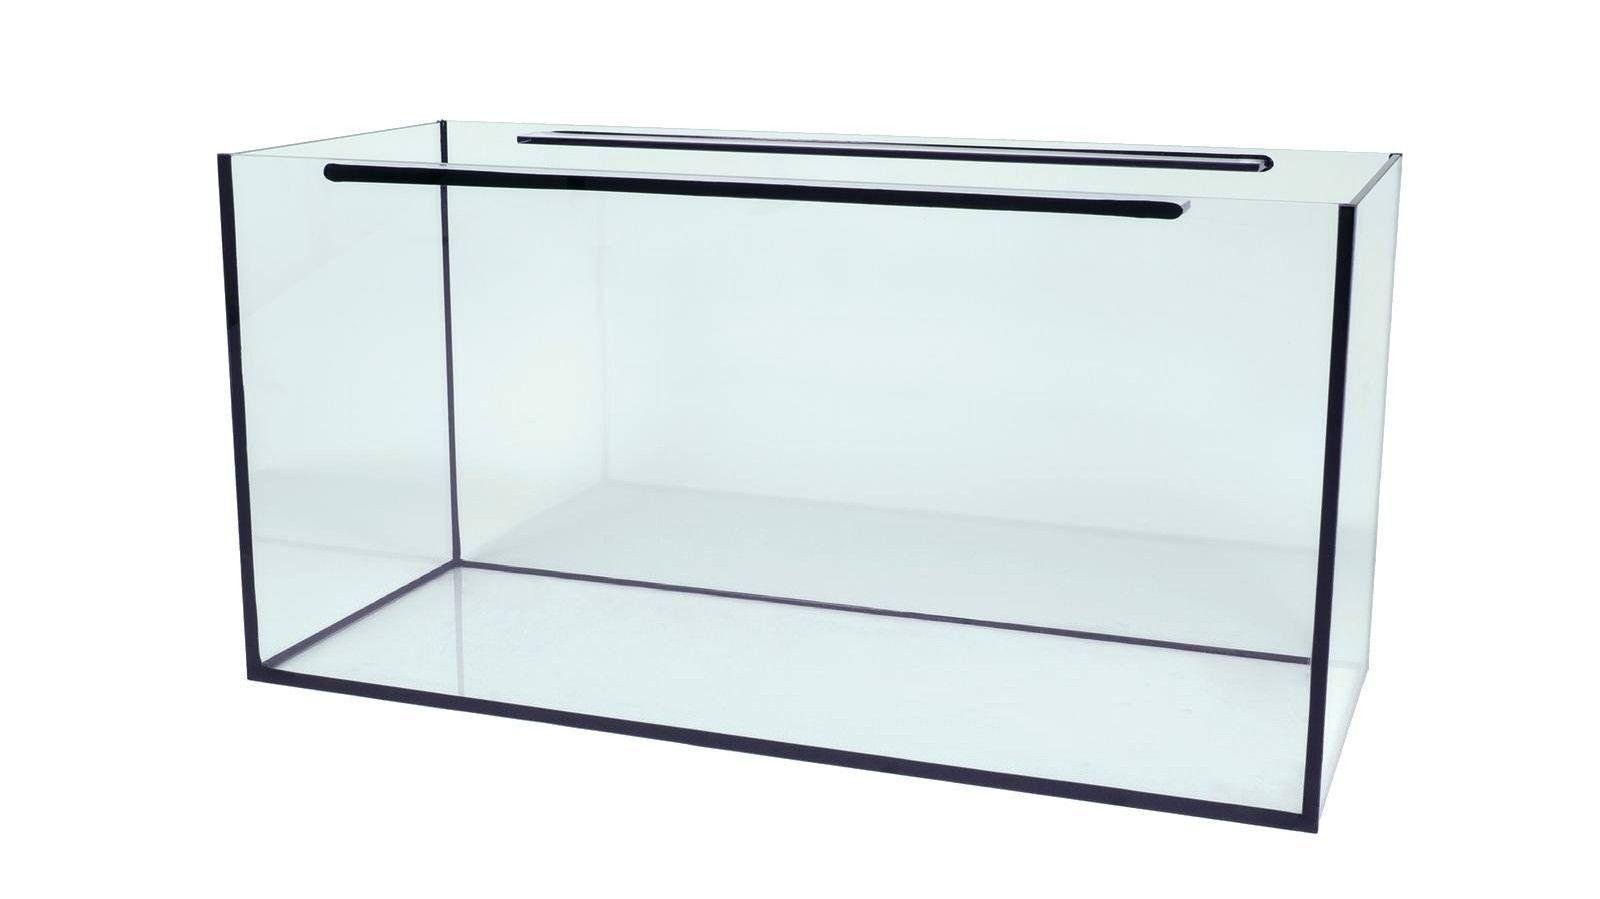 Aquarium 100x60x50cm 10 mm  TOP-Preis  Schwarze oder transparente Verklebung